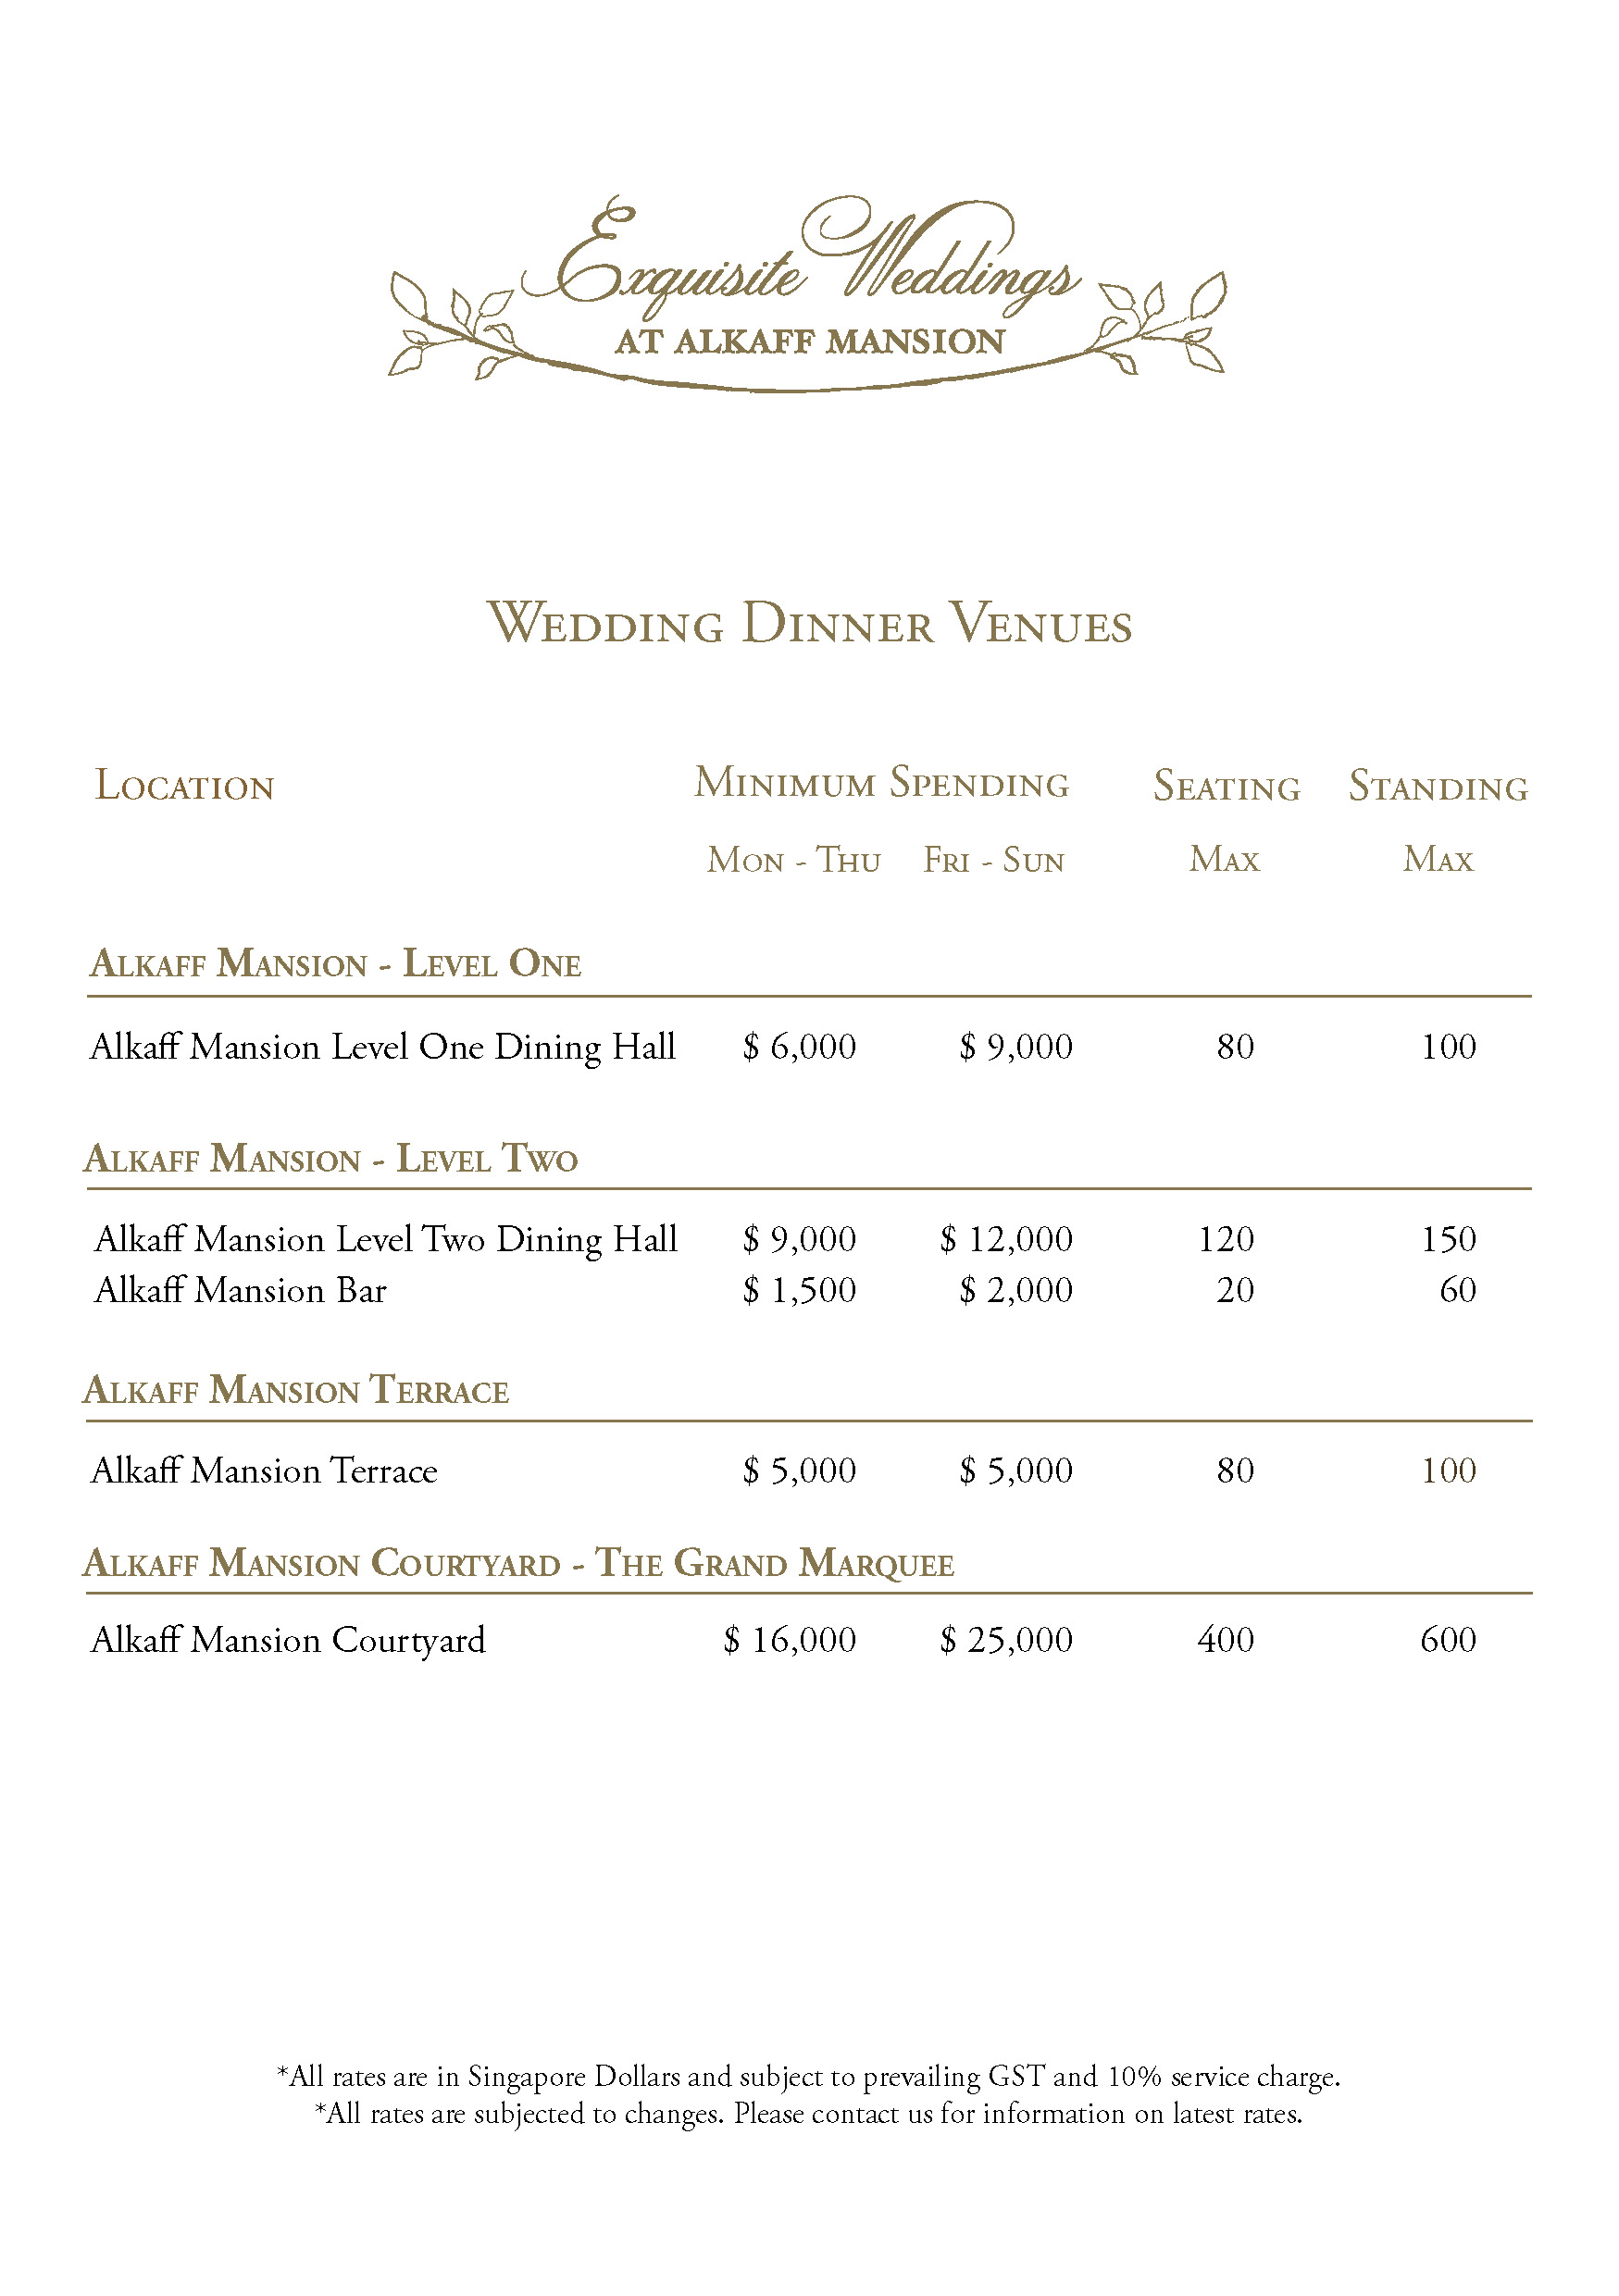 Alkaff Mansion Ristorante Wedding Venue 2016 Singapore Bridal Planner Dream Boutique Rate Card 2017